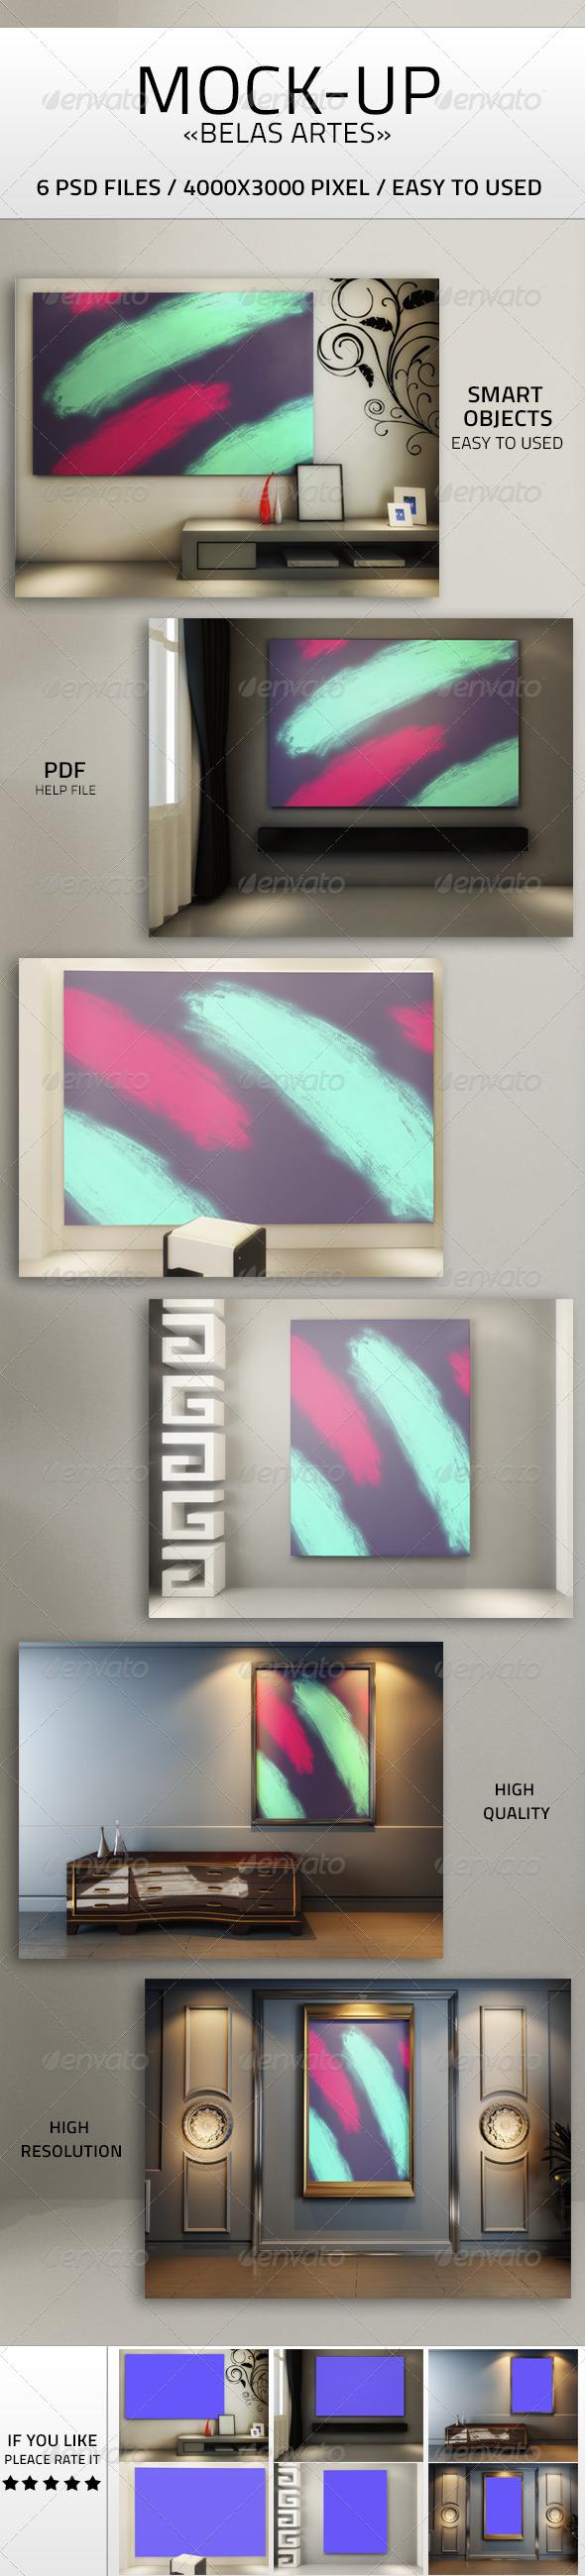 Art Mock-up PSD - Product Mock-Ups Graphics